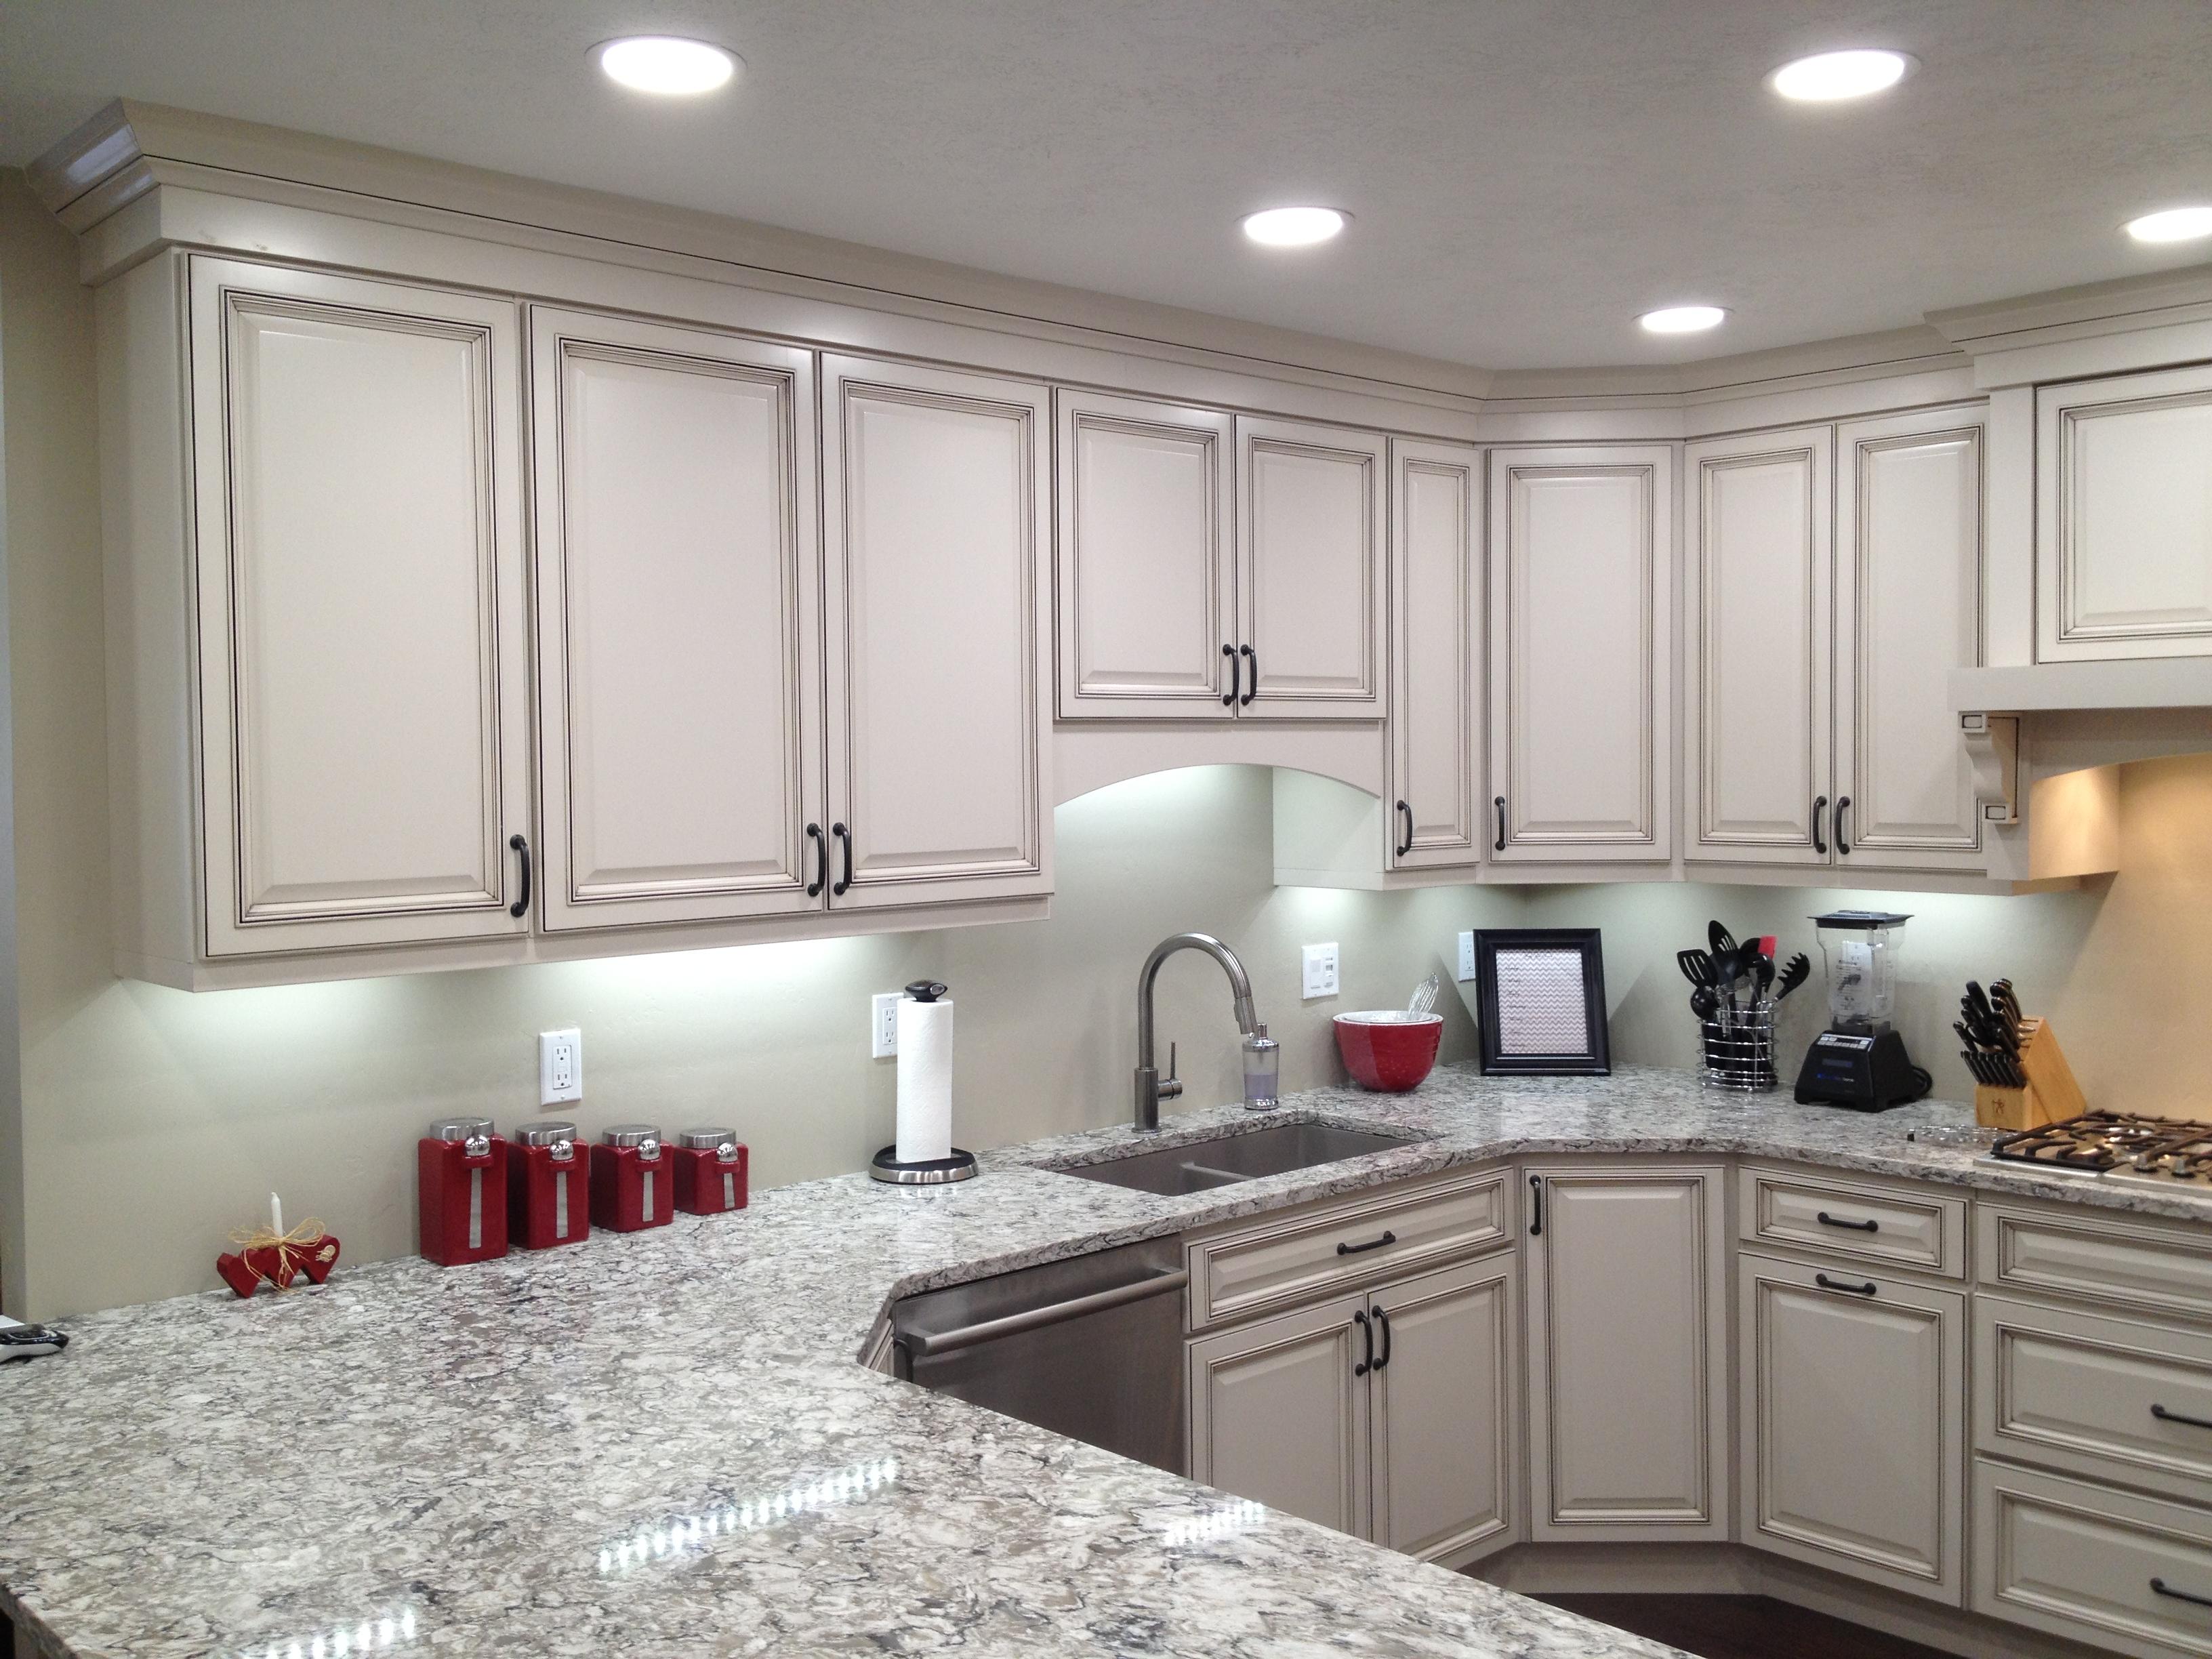 wireless led under cabinet lighting under cabinet kitchen lighting Pax LED Under cabinet lighting